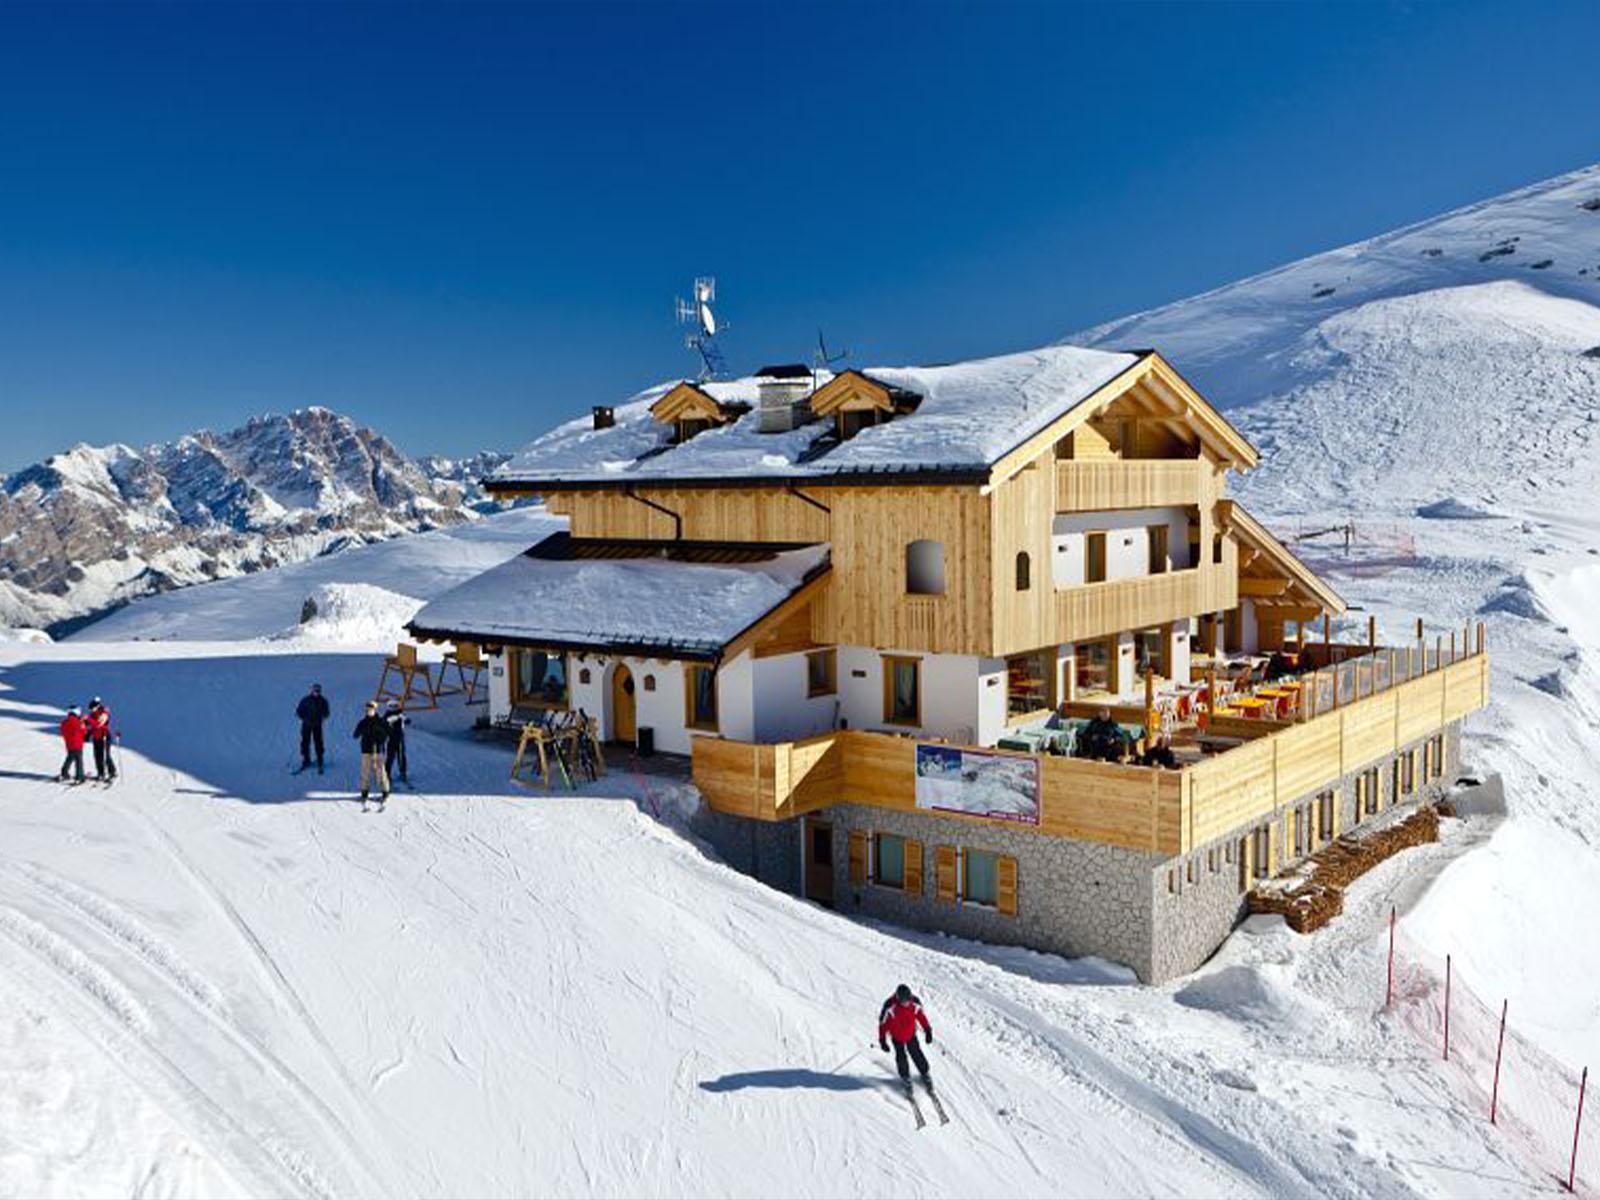 Rifugio Averau Dolomiti Ampezzane